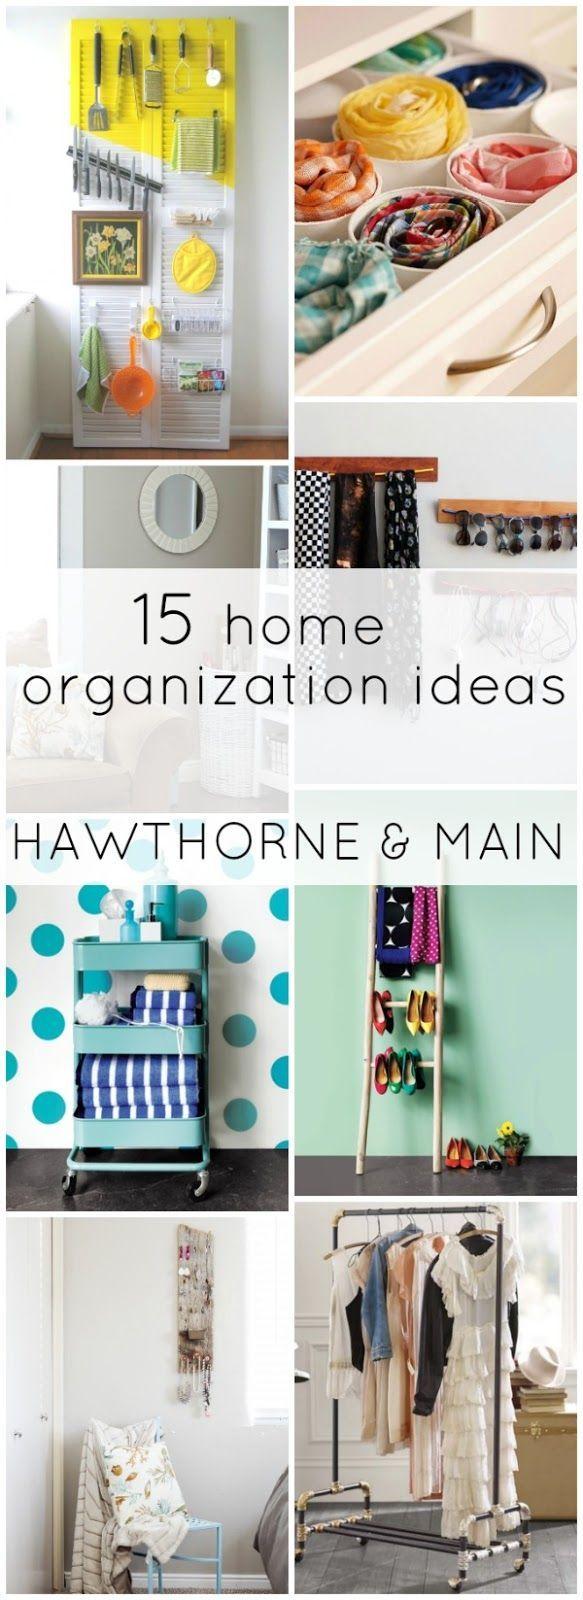 98 best Organization images on Pinterest | Organization ideas ...